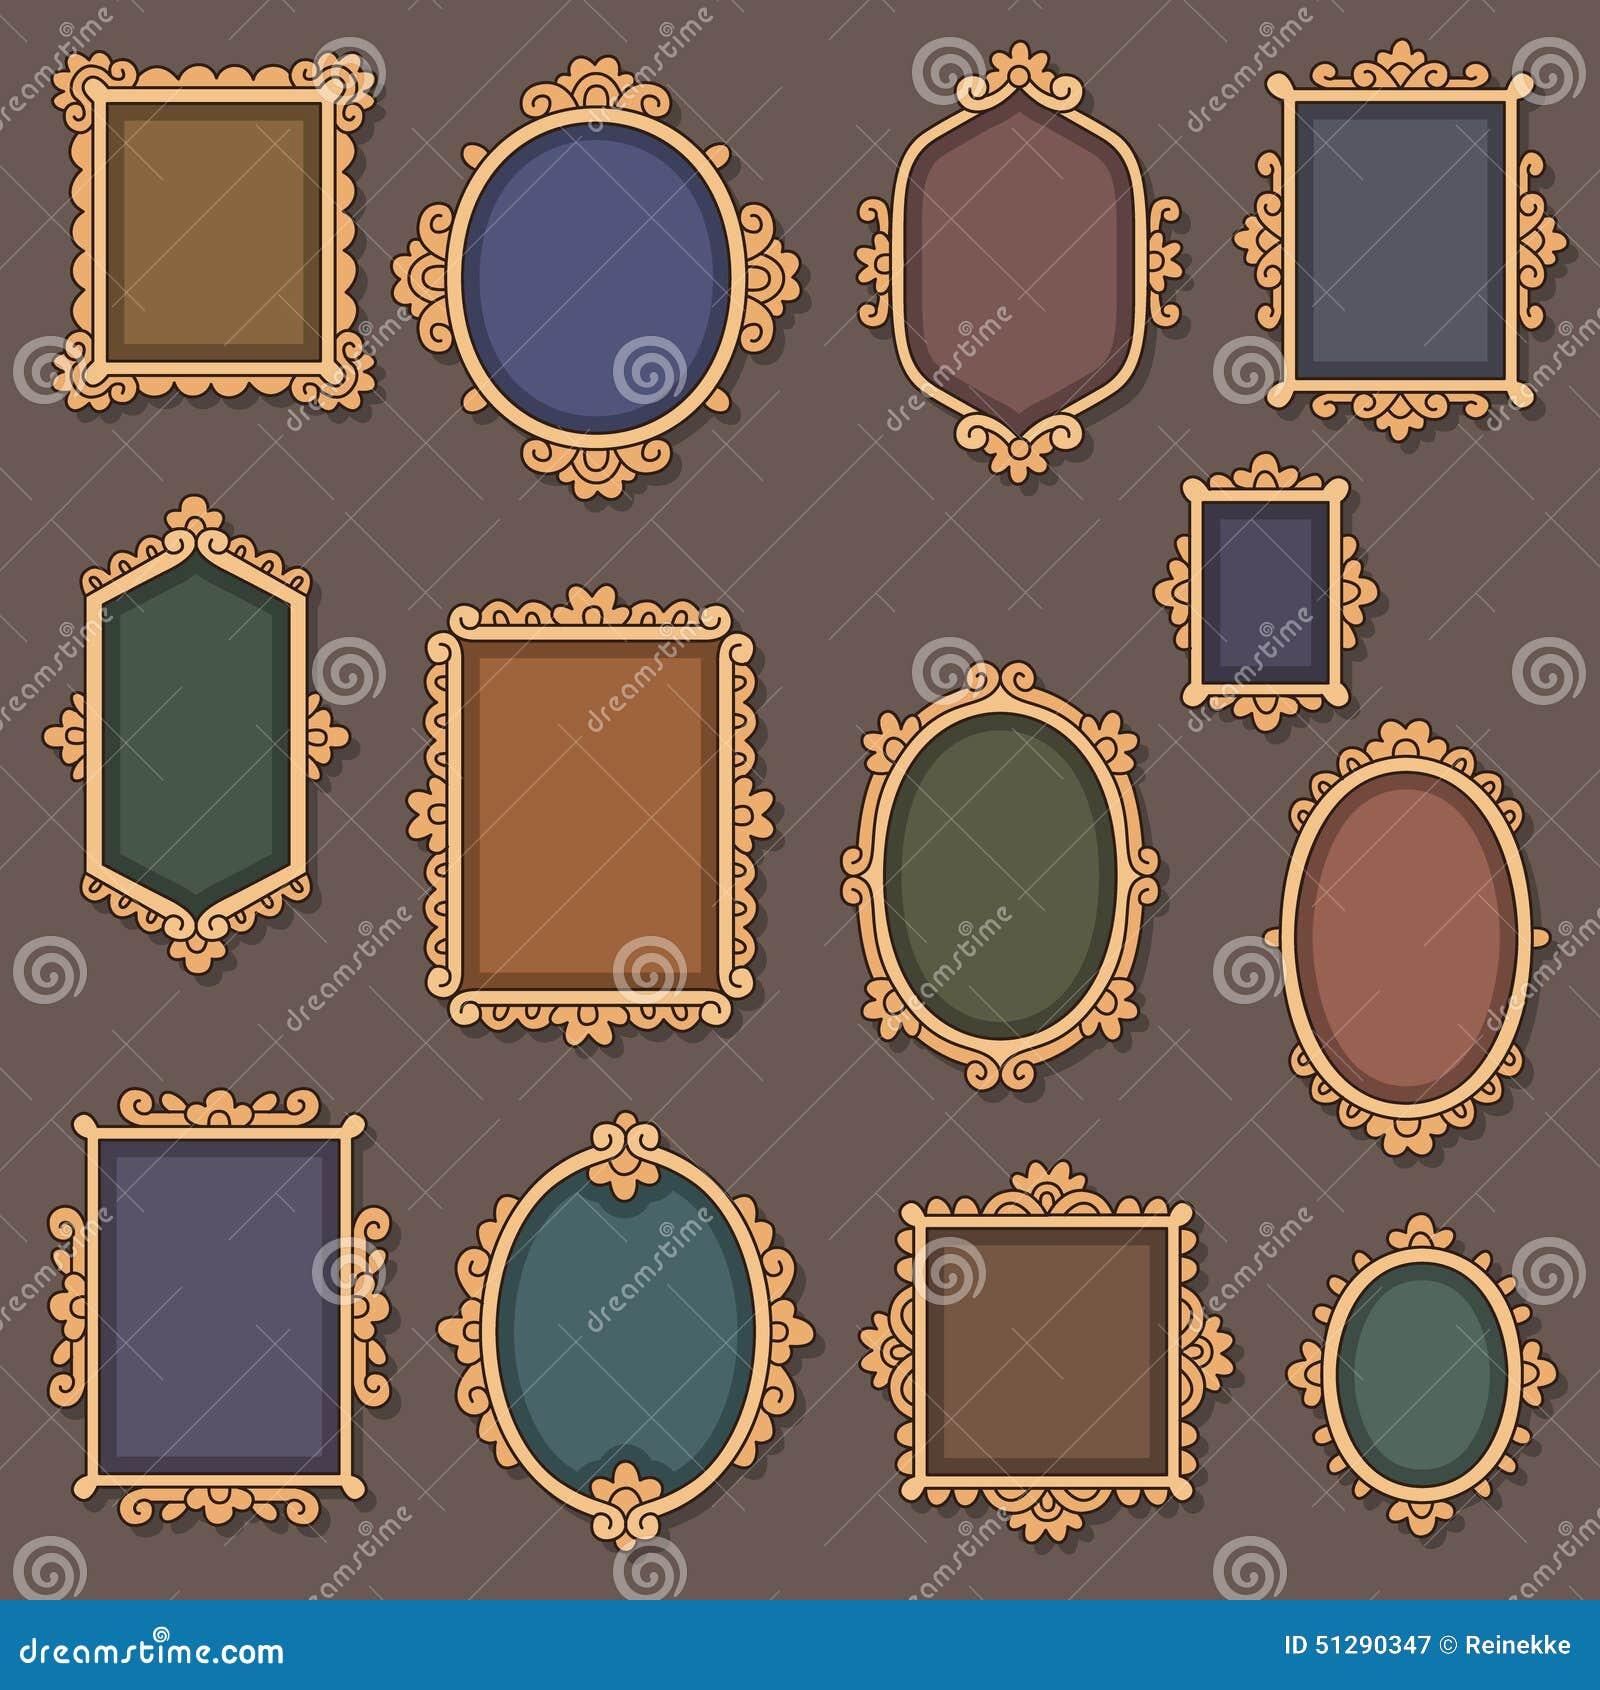 retro vignettes stock vector image 51290347. Black Bedroom Furniture Sets. Home Design Ideas